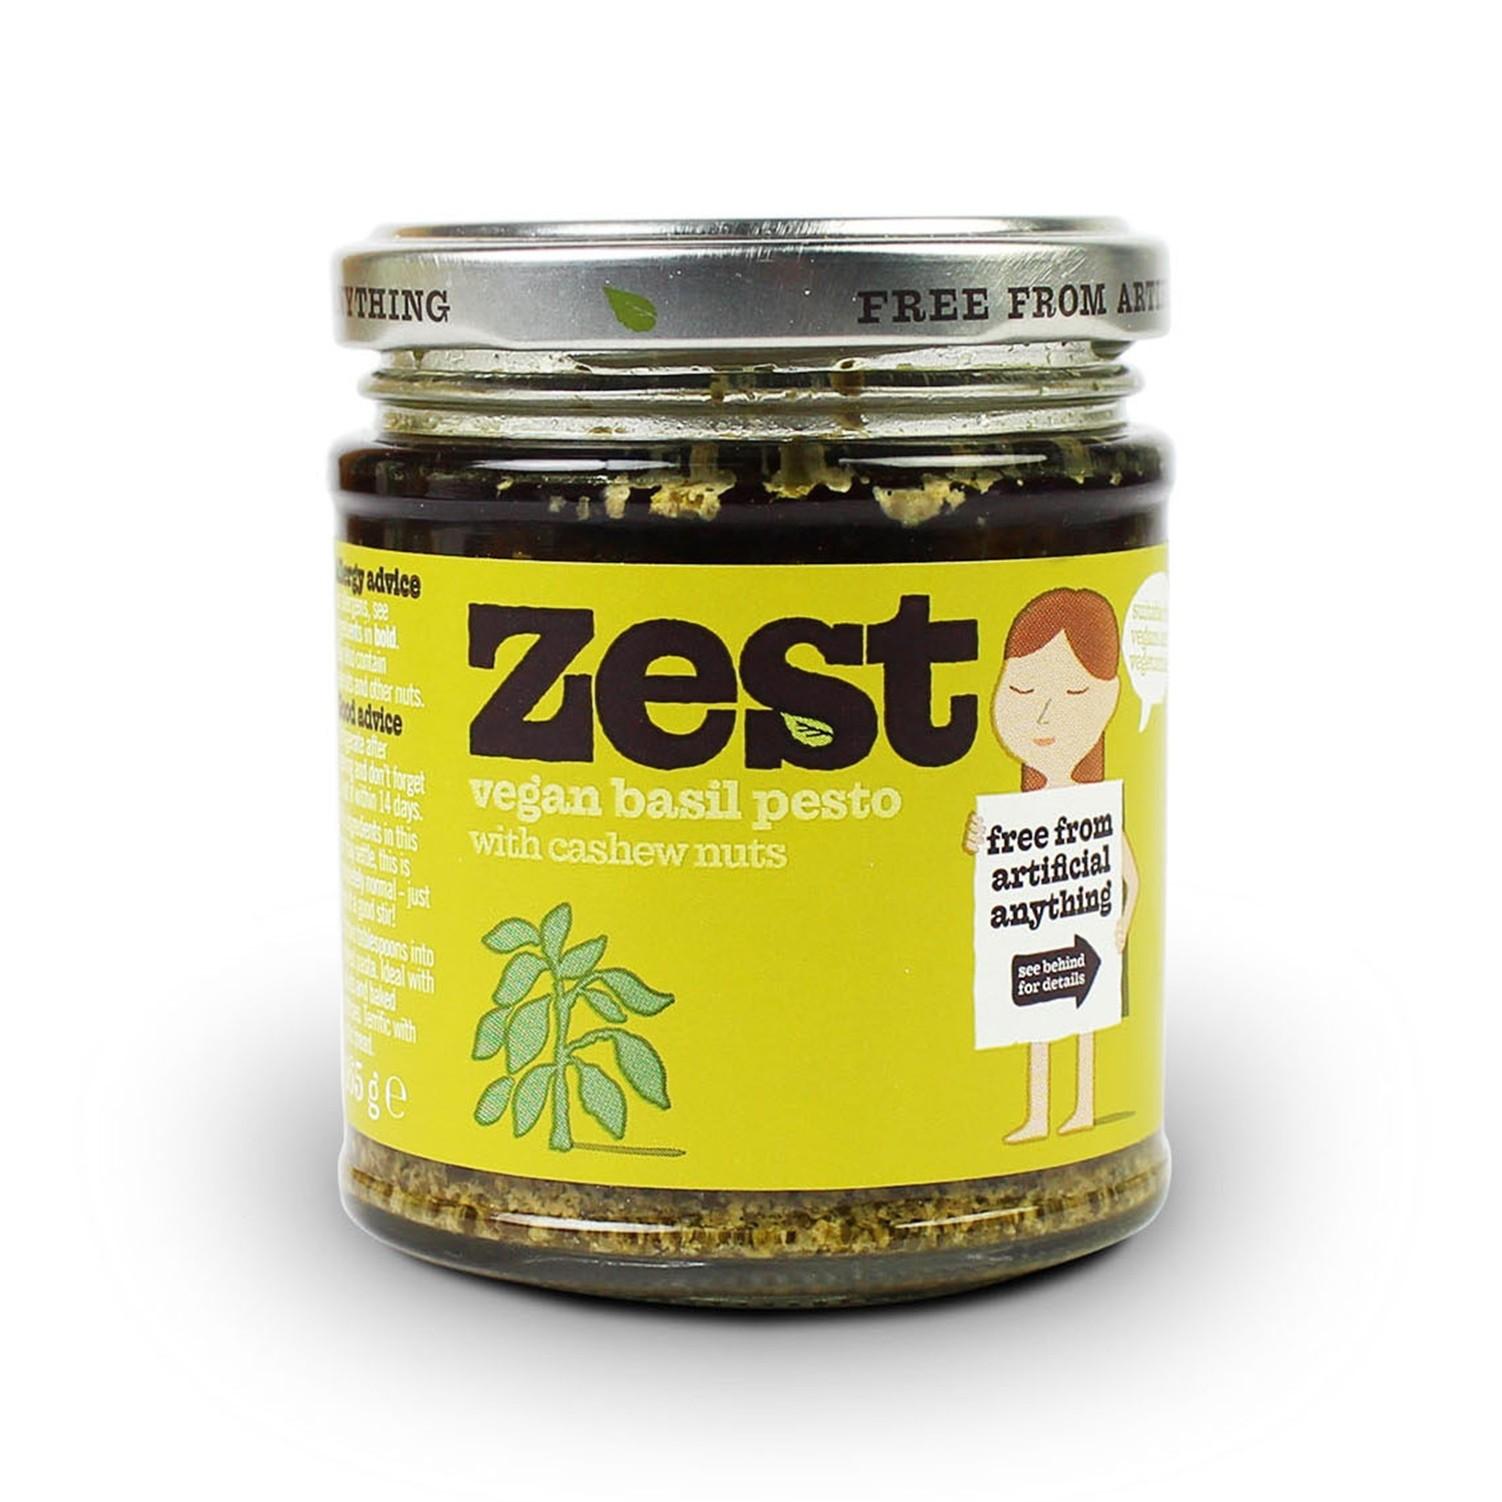 Pesto with Cashew Nuts - vegan - 165g